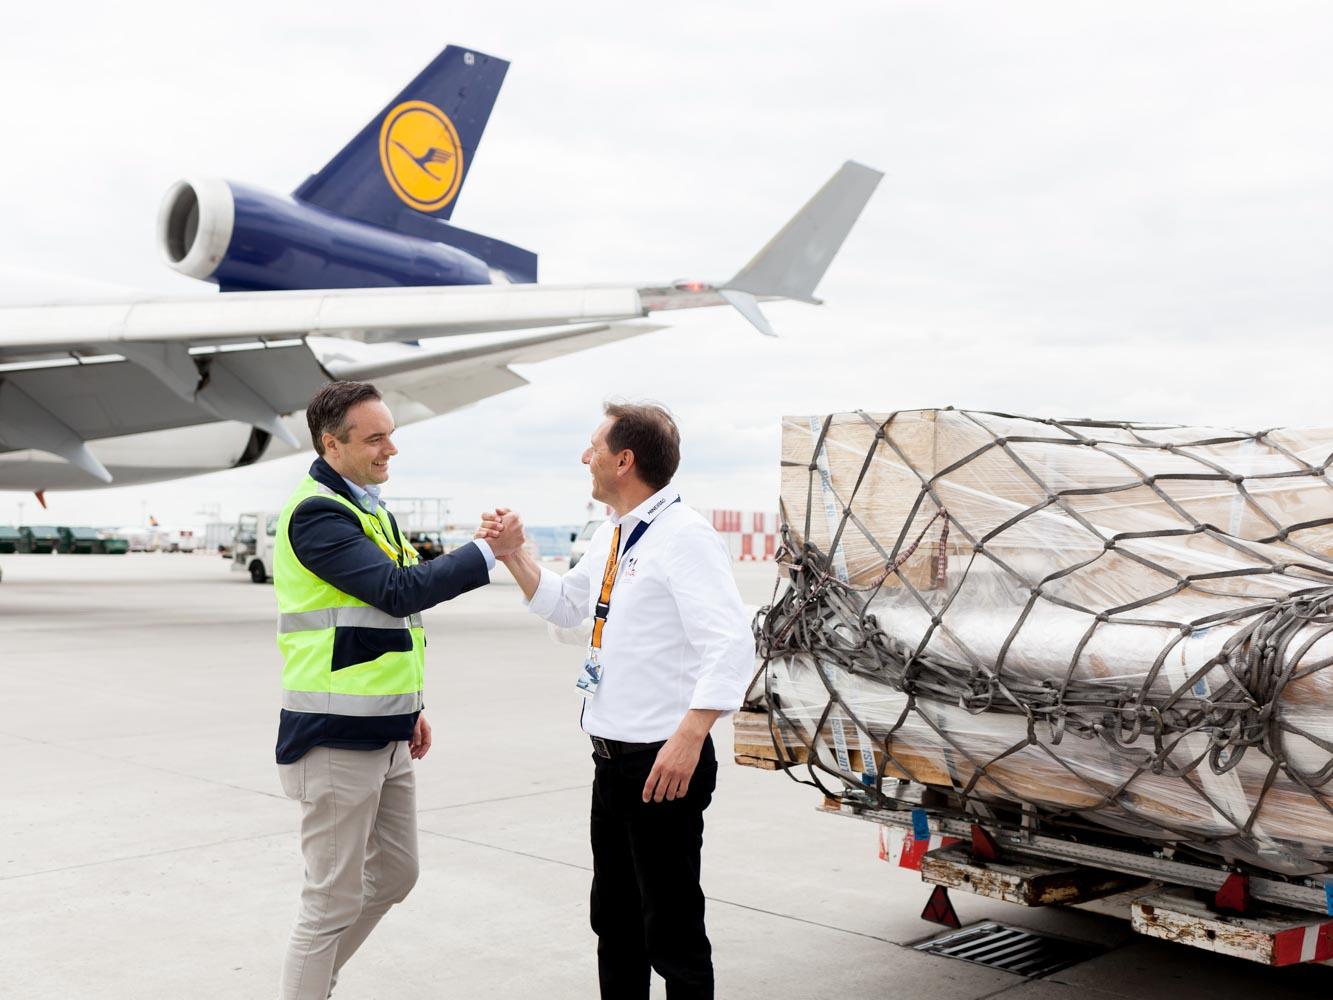 reportage_daniel_kummer-lufthansa_cargo_dahw_2018-09